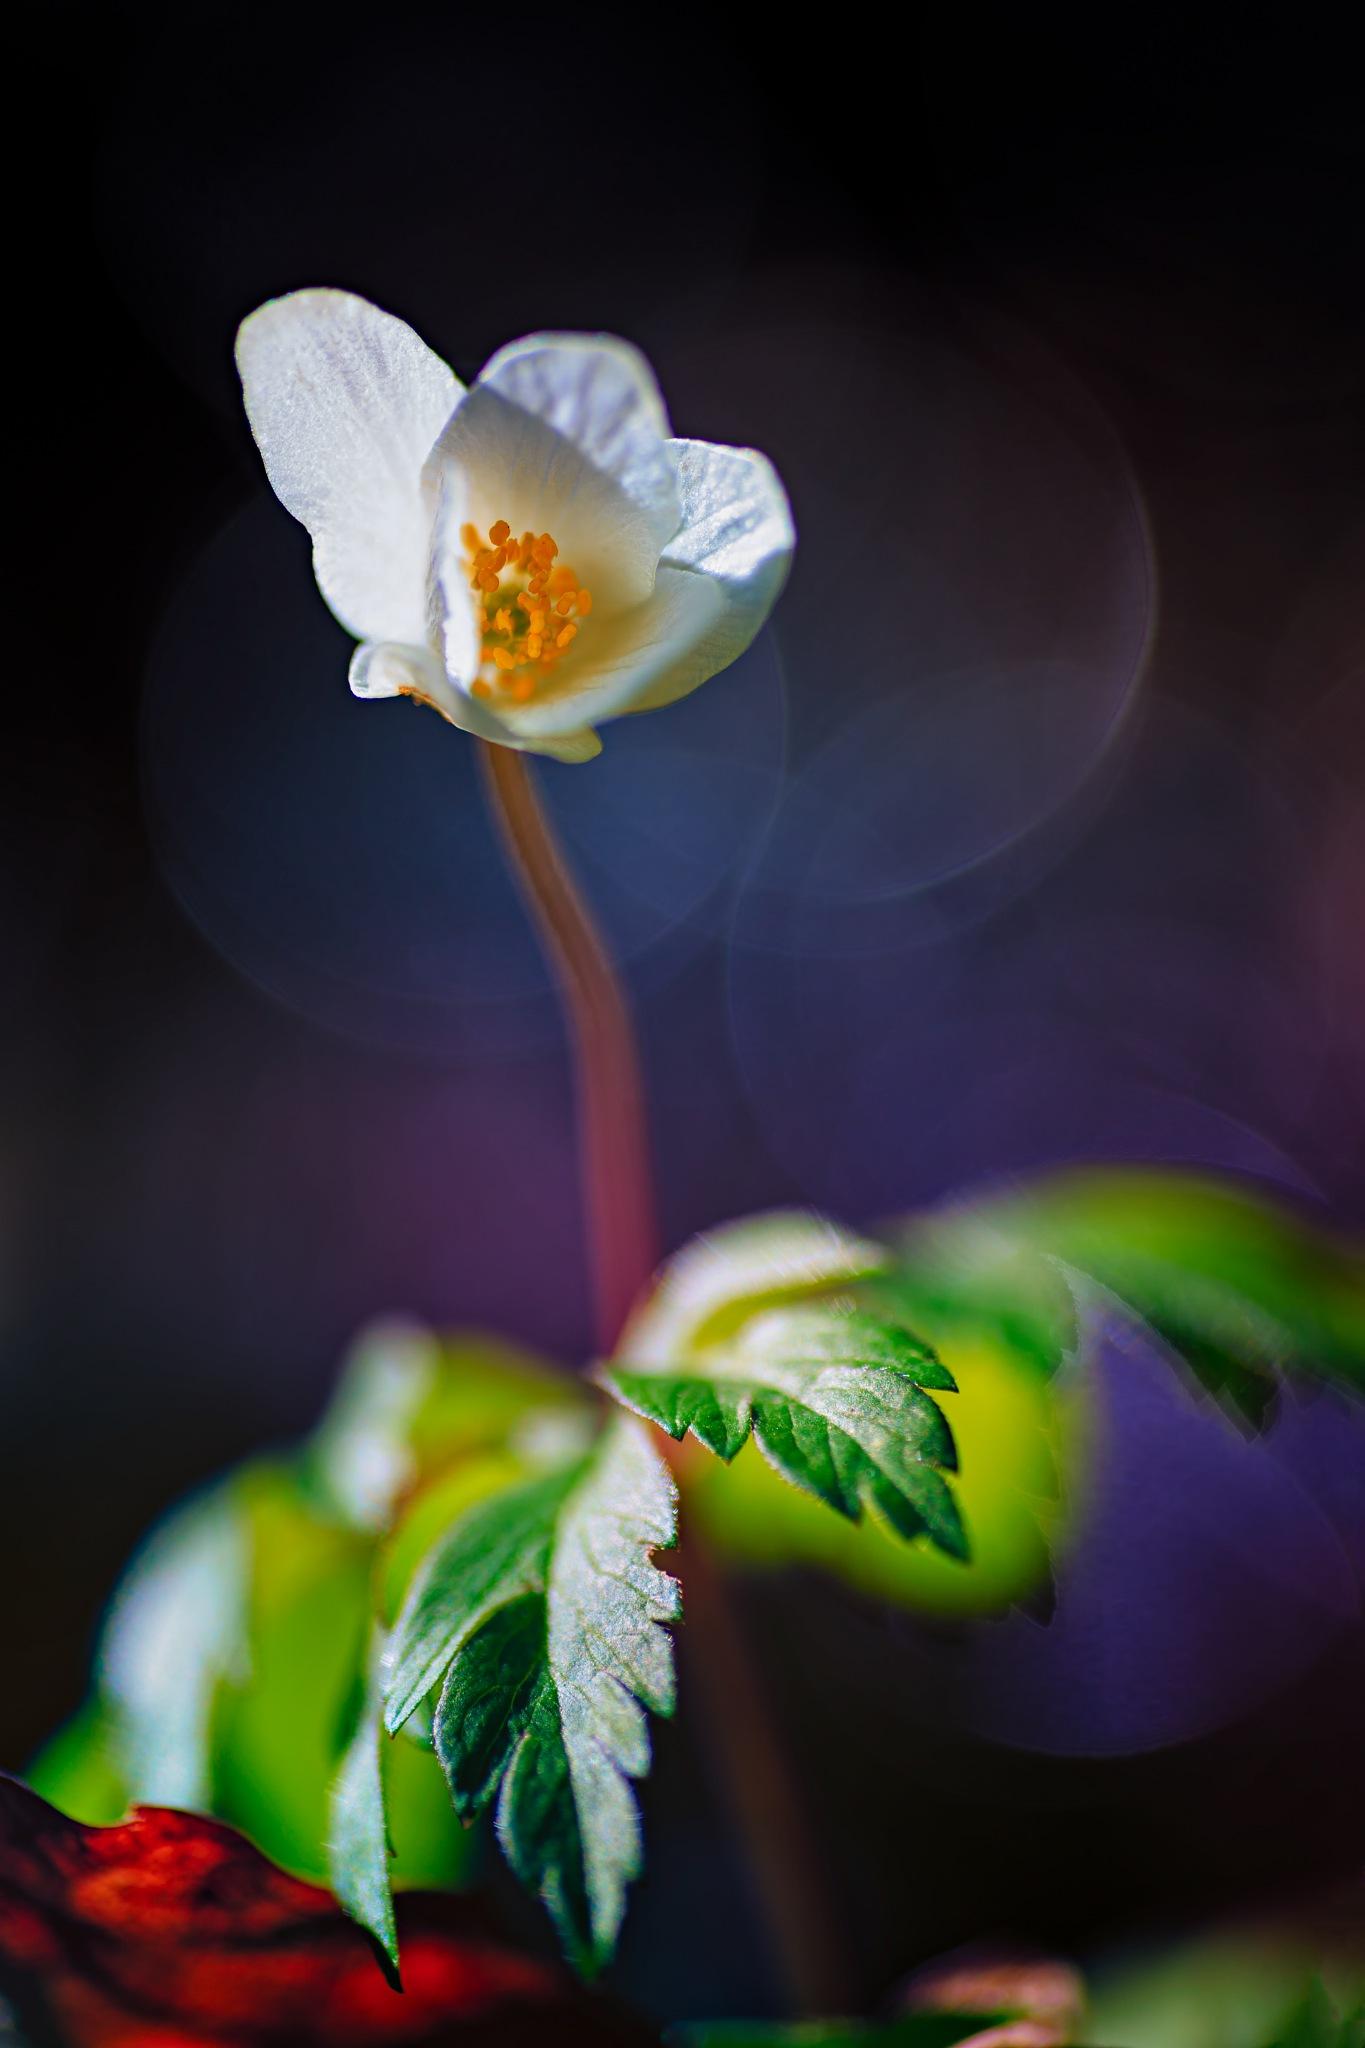 Wood Anemone (Anemone nemorosa) by Mikael Jakobsson